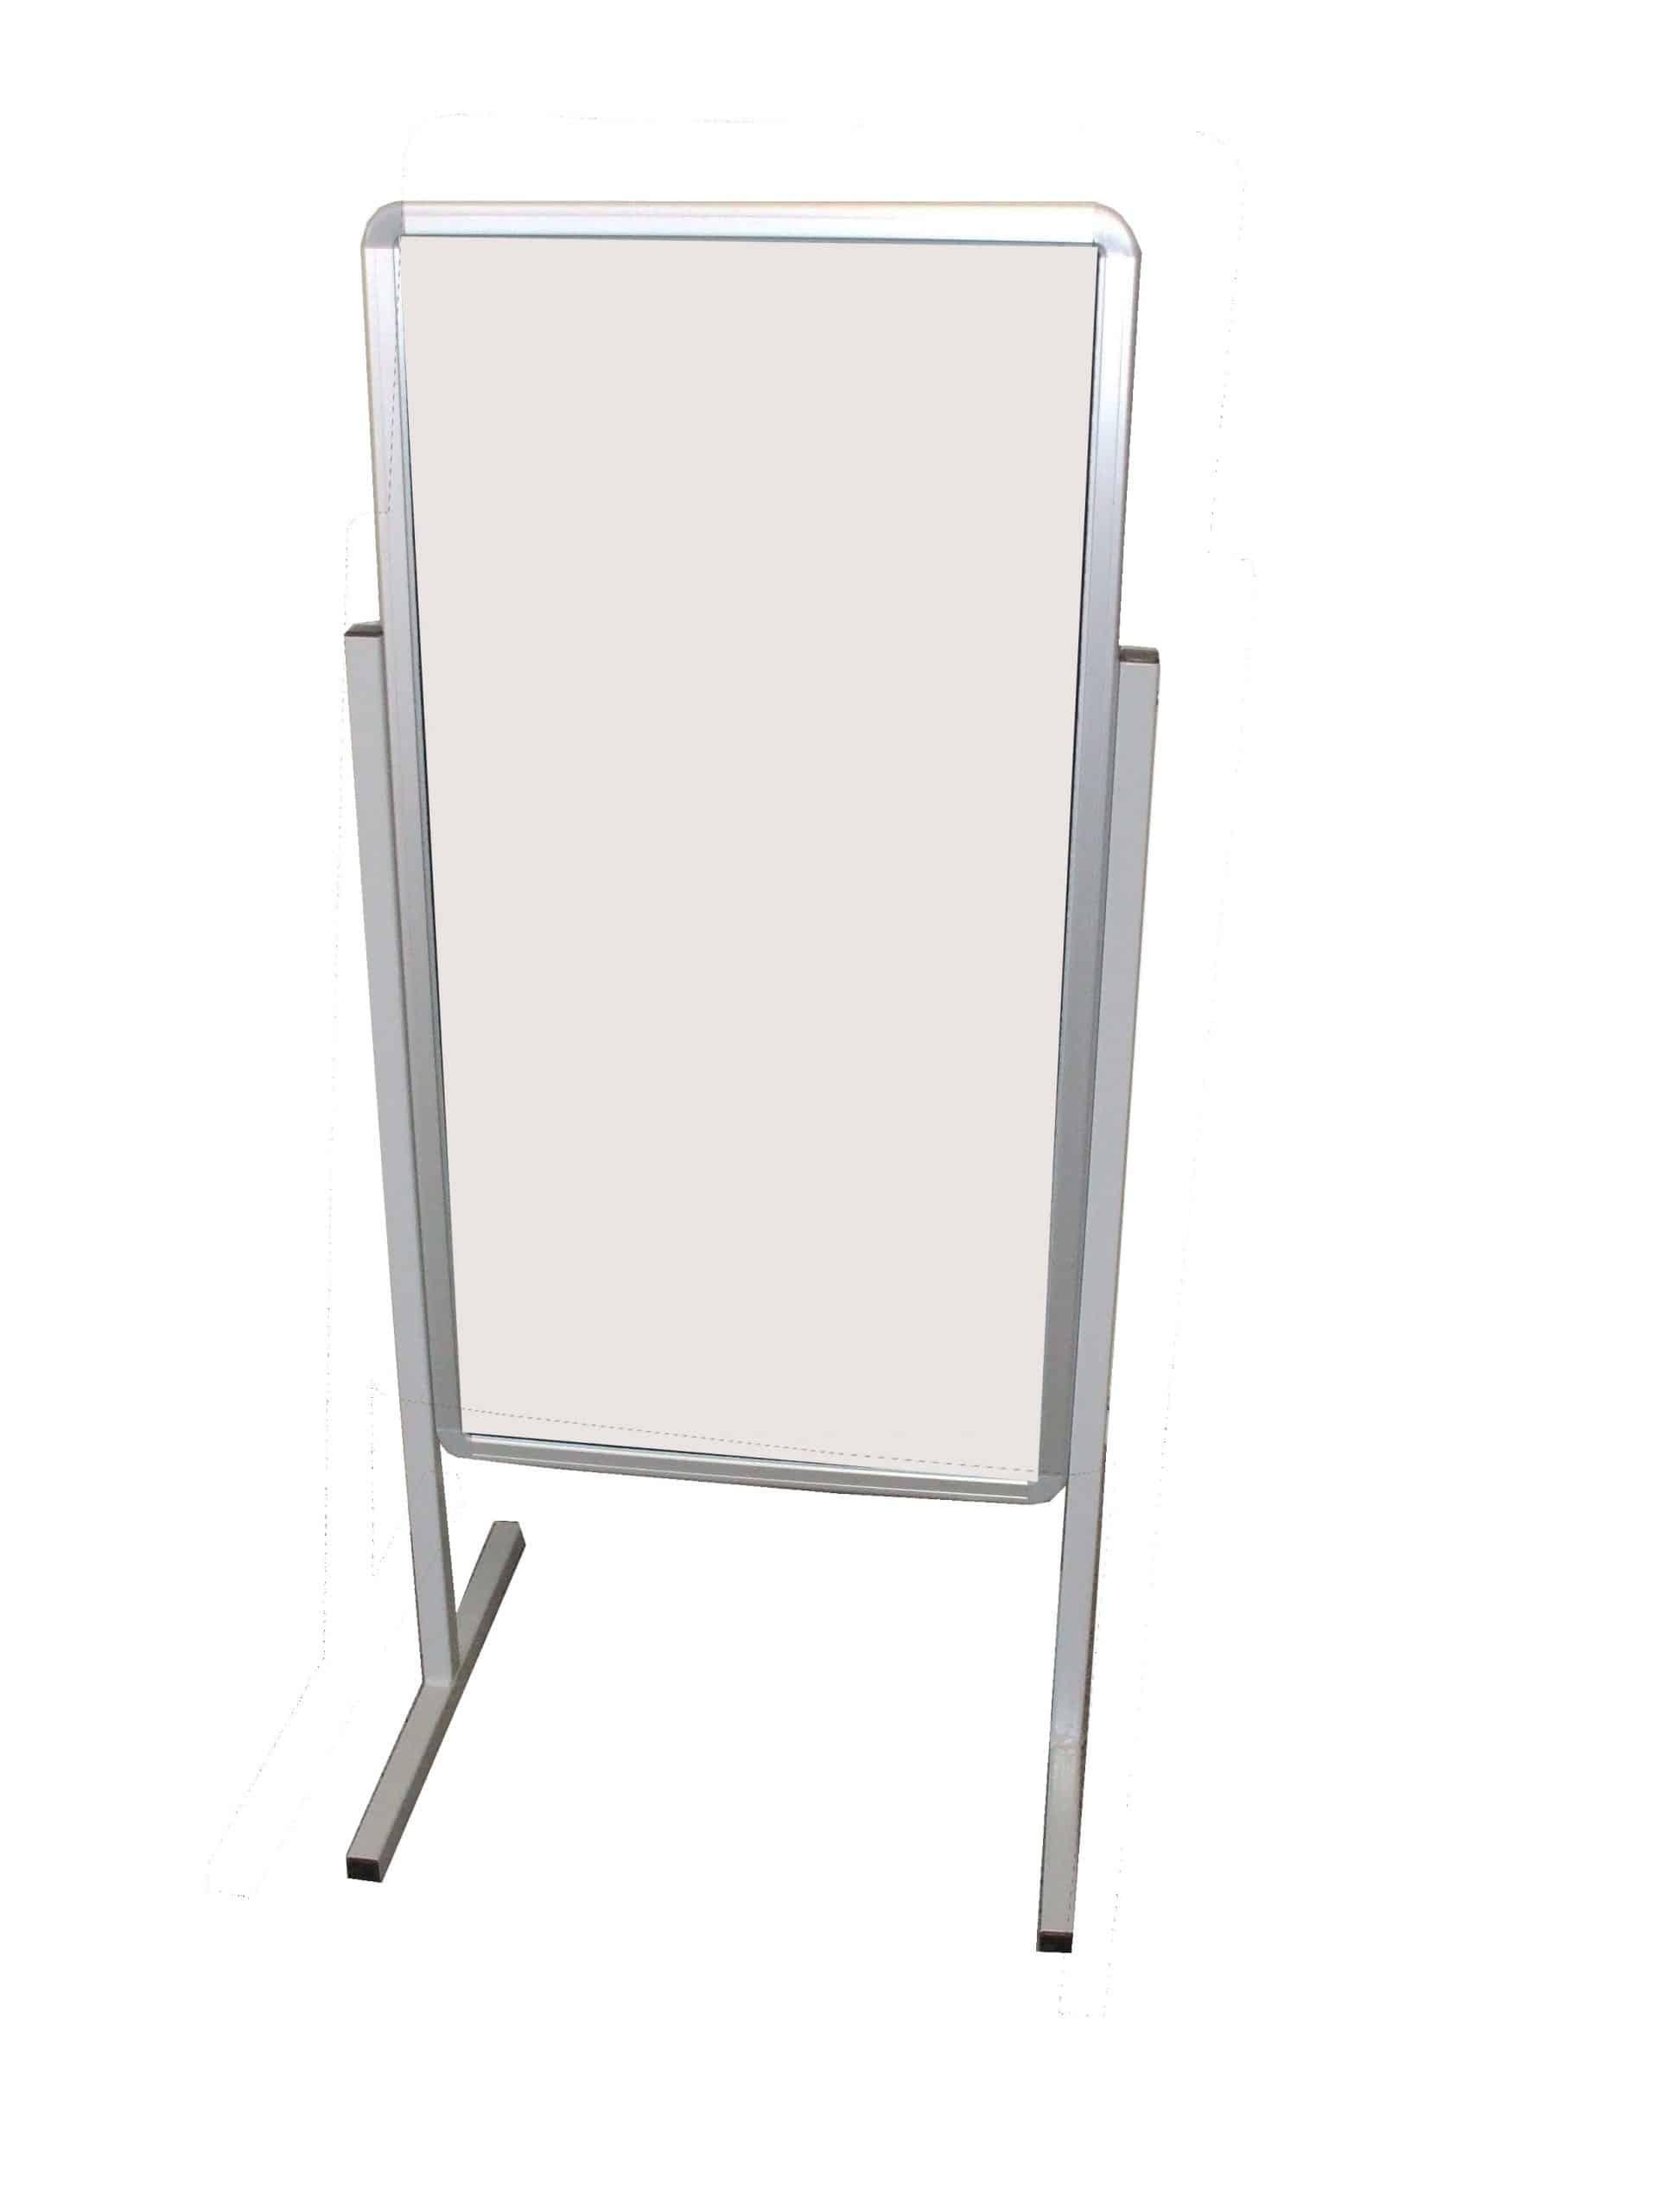 Entryway whiteboard 600 x 900